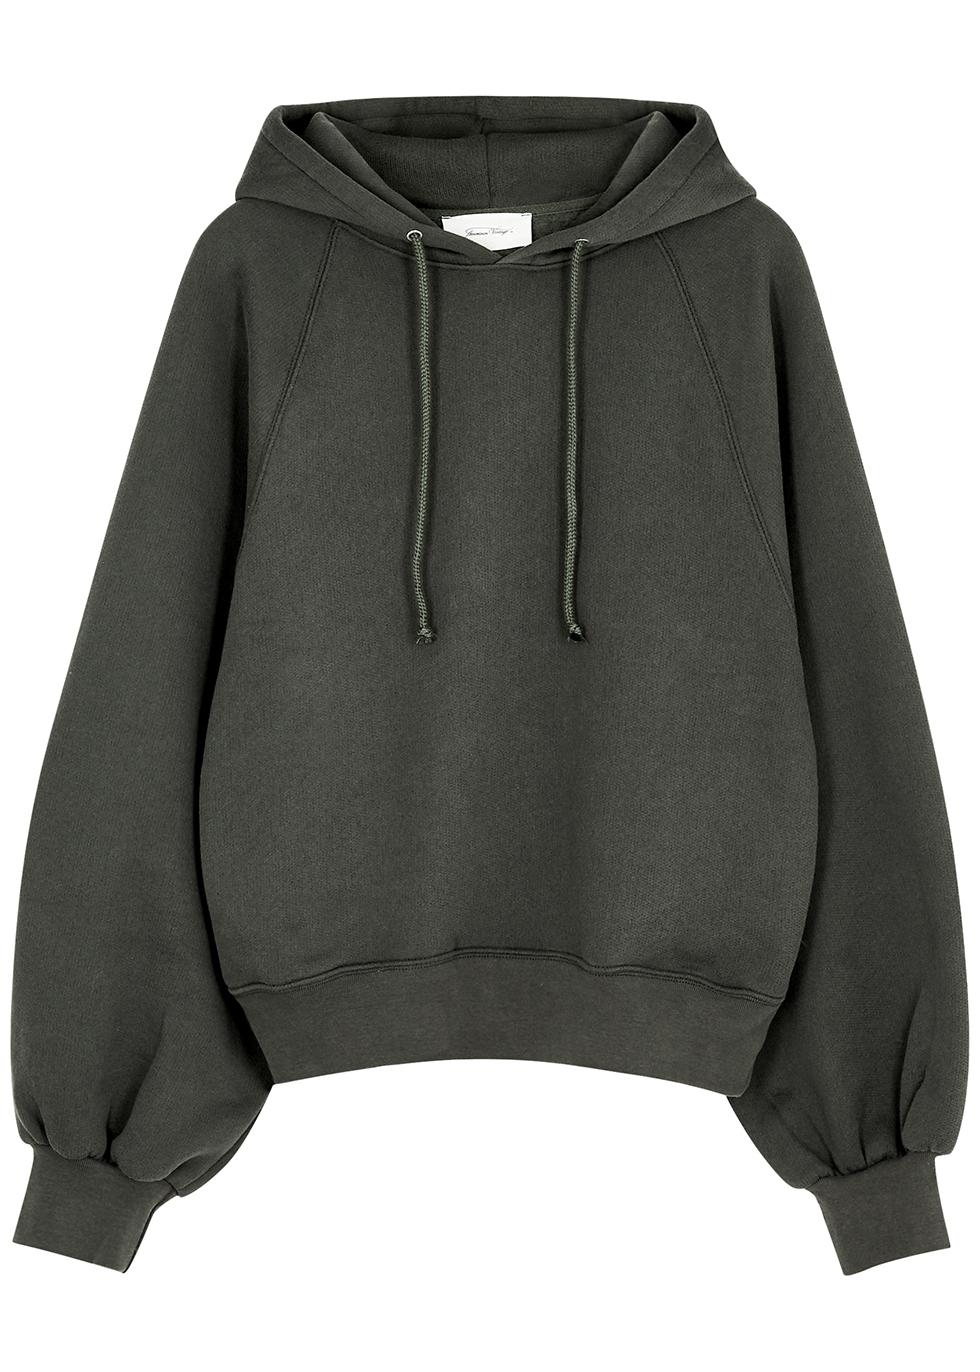 Ikatown grey hooded cotton-blend sweatshirt